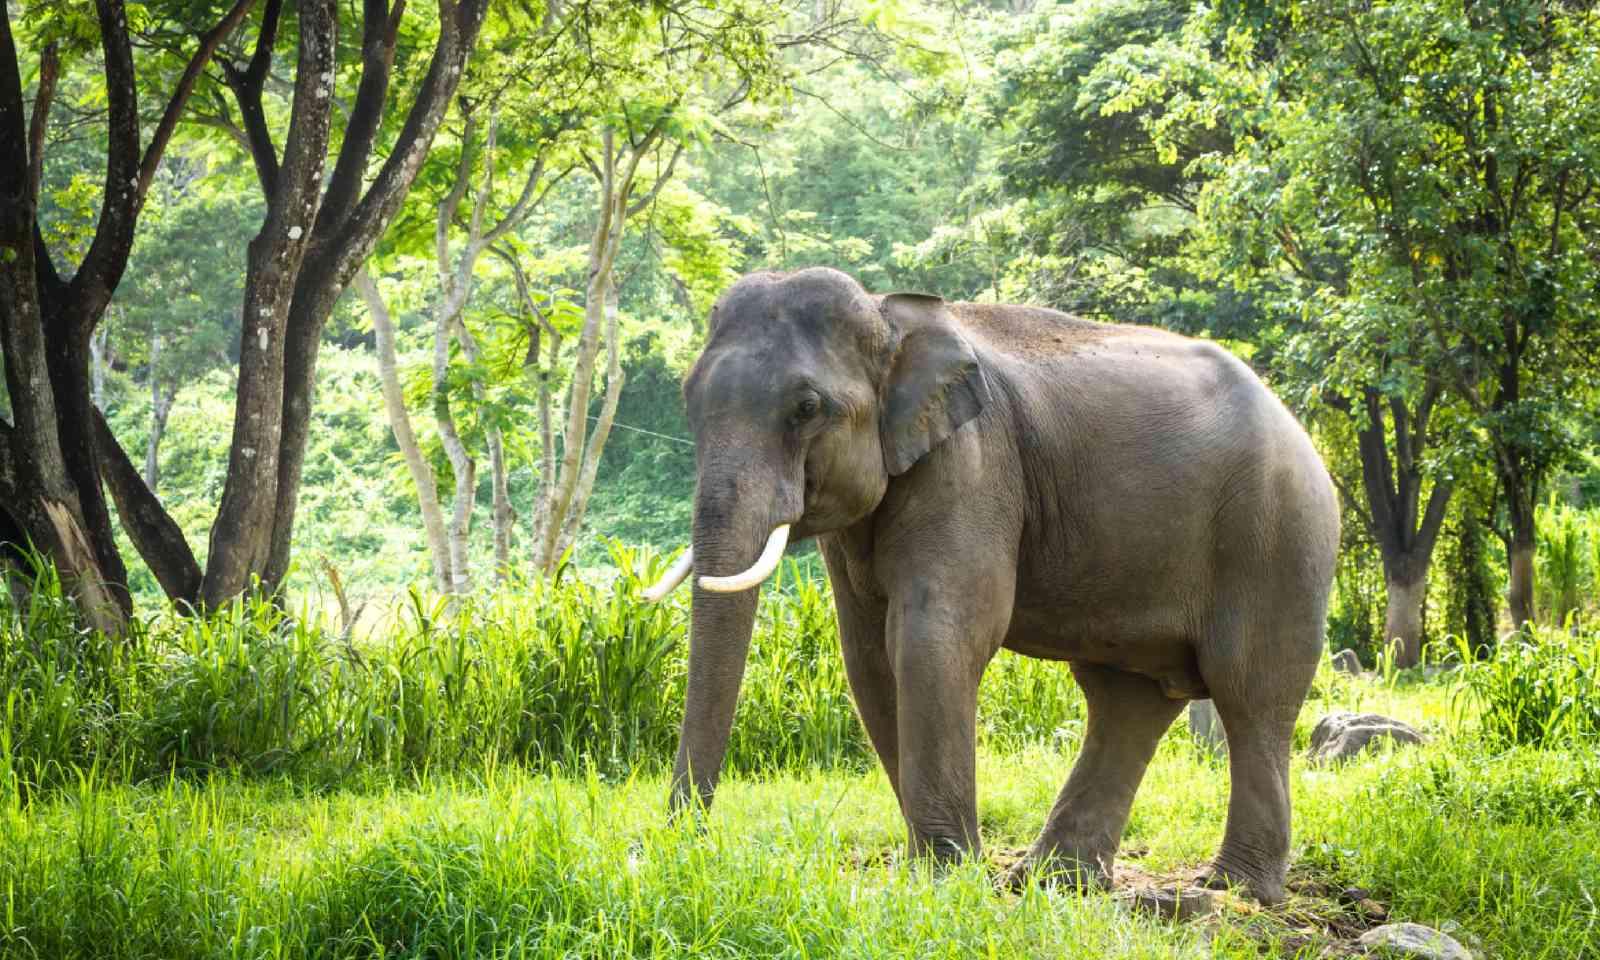 Mature bull elephant in Thailand (Shutterstock)